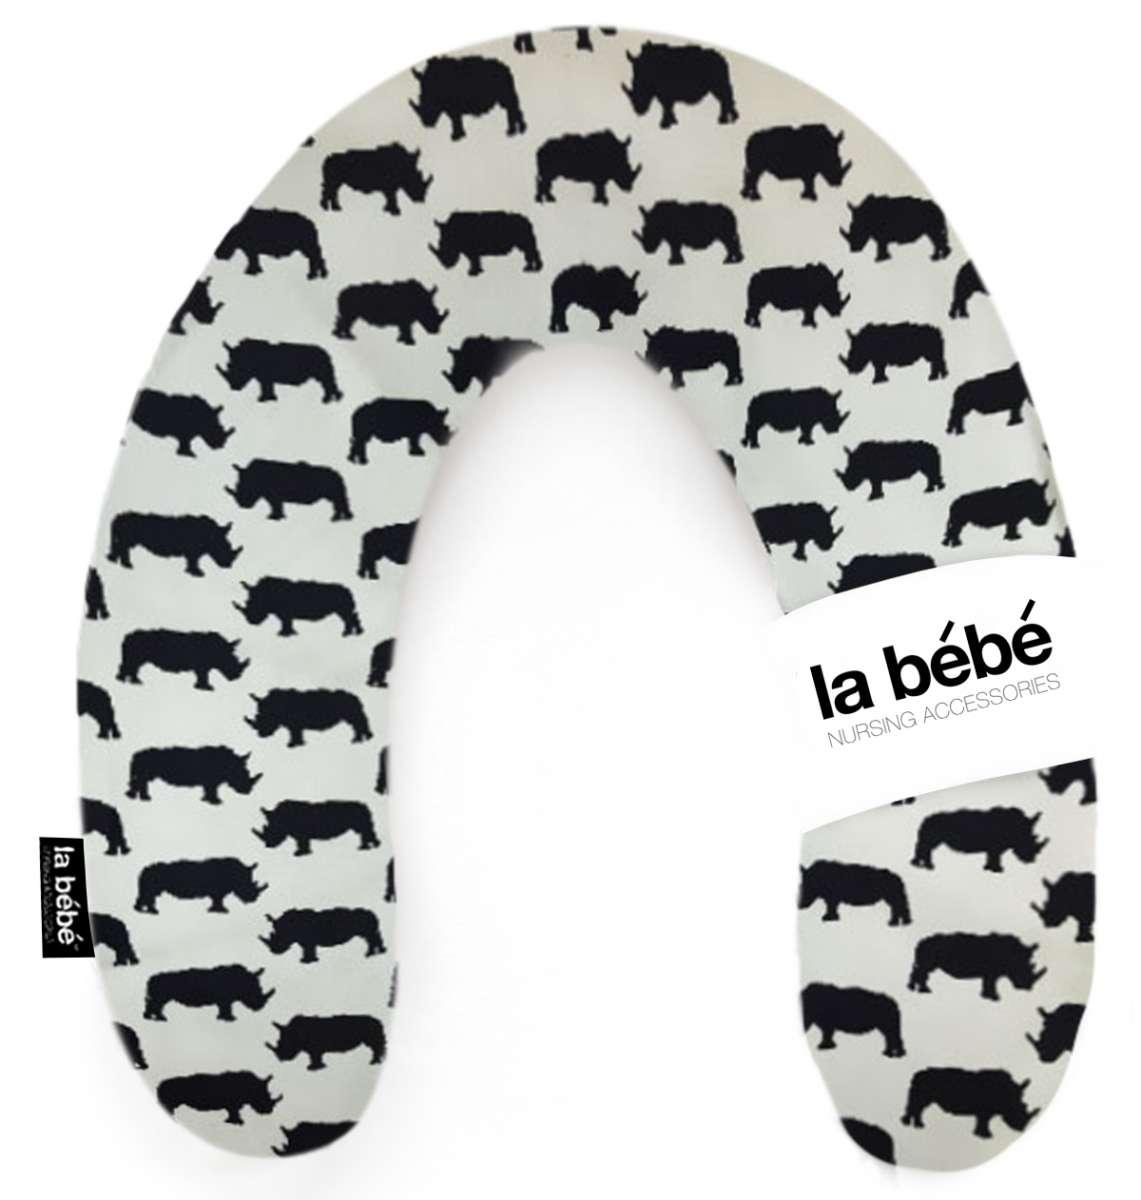 La Bebe Rich Cotton Nursing Maternity Pillow Sarvikuono Pakaviņš pakavs mazuļa barošanai, gulēšanai